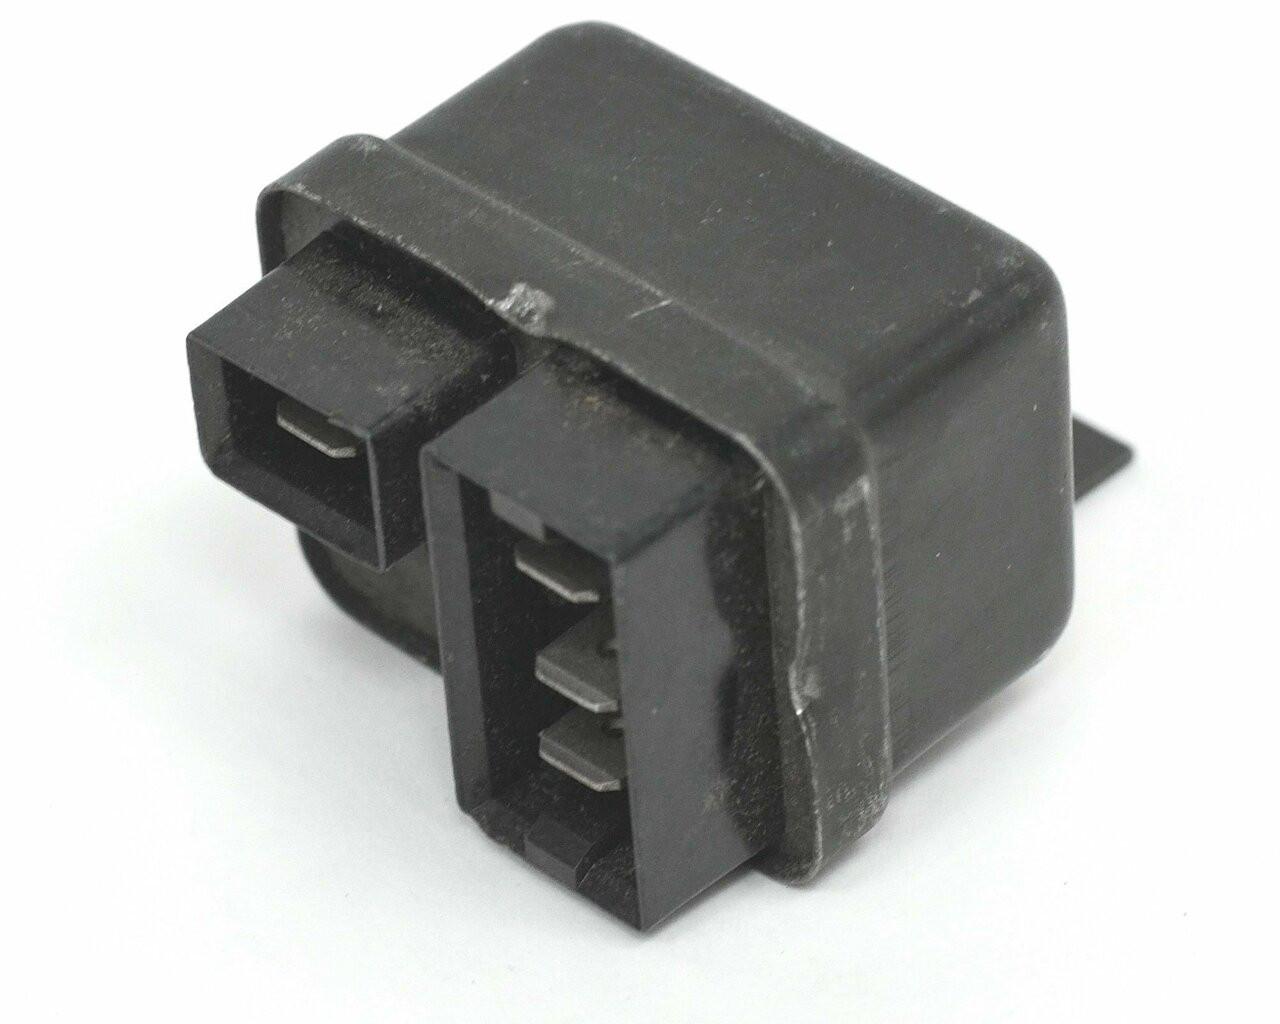 Wiper Intermittent Relay - 1983-85